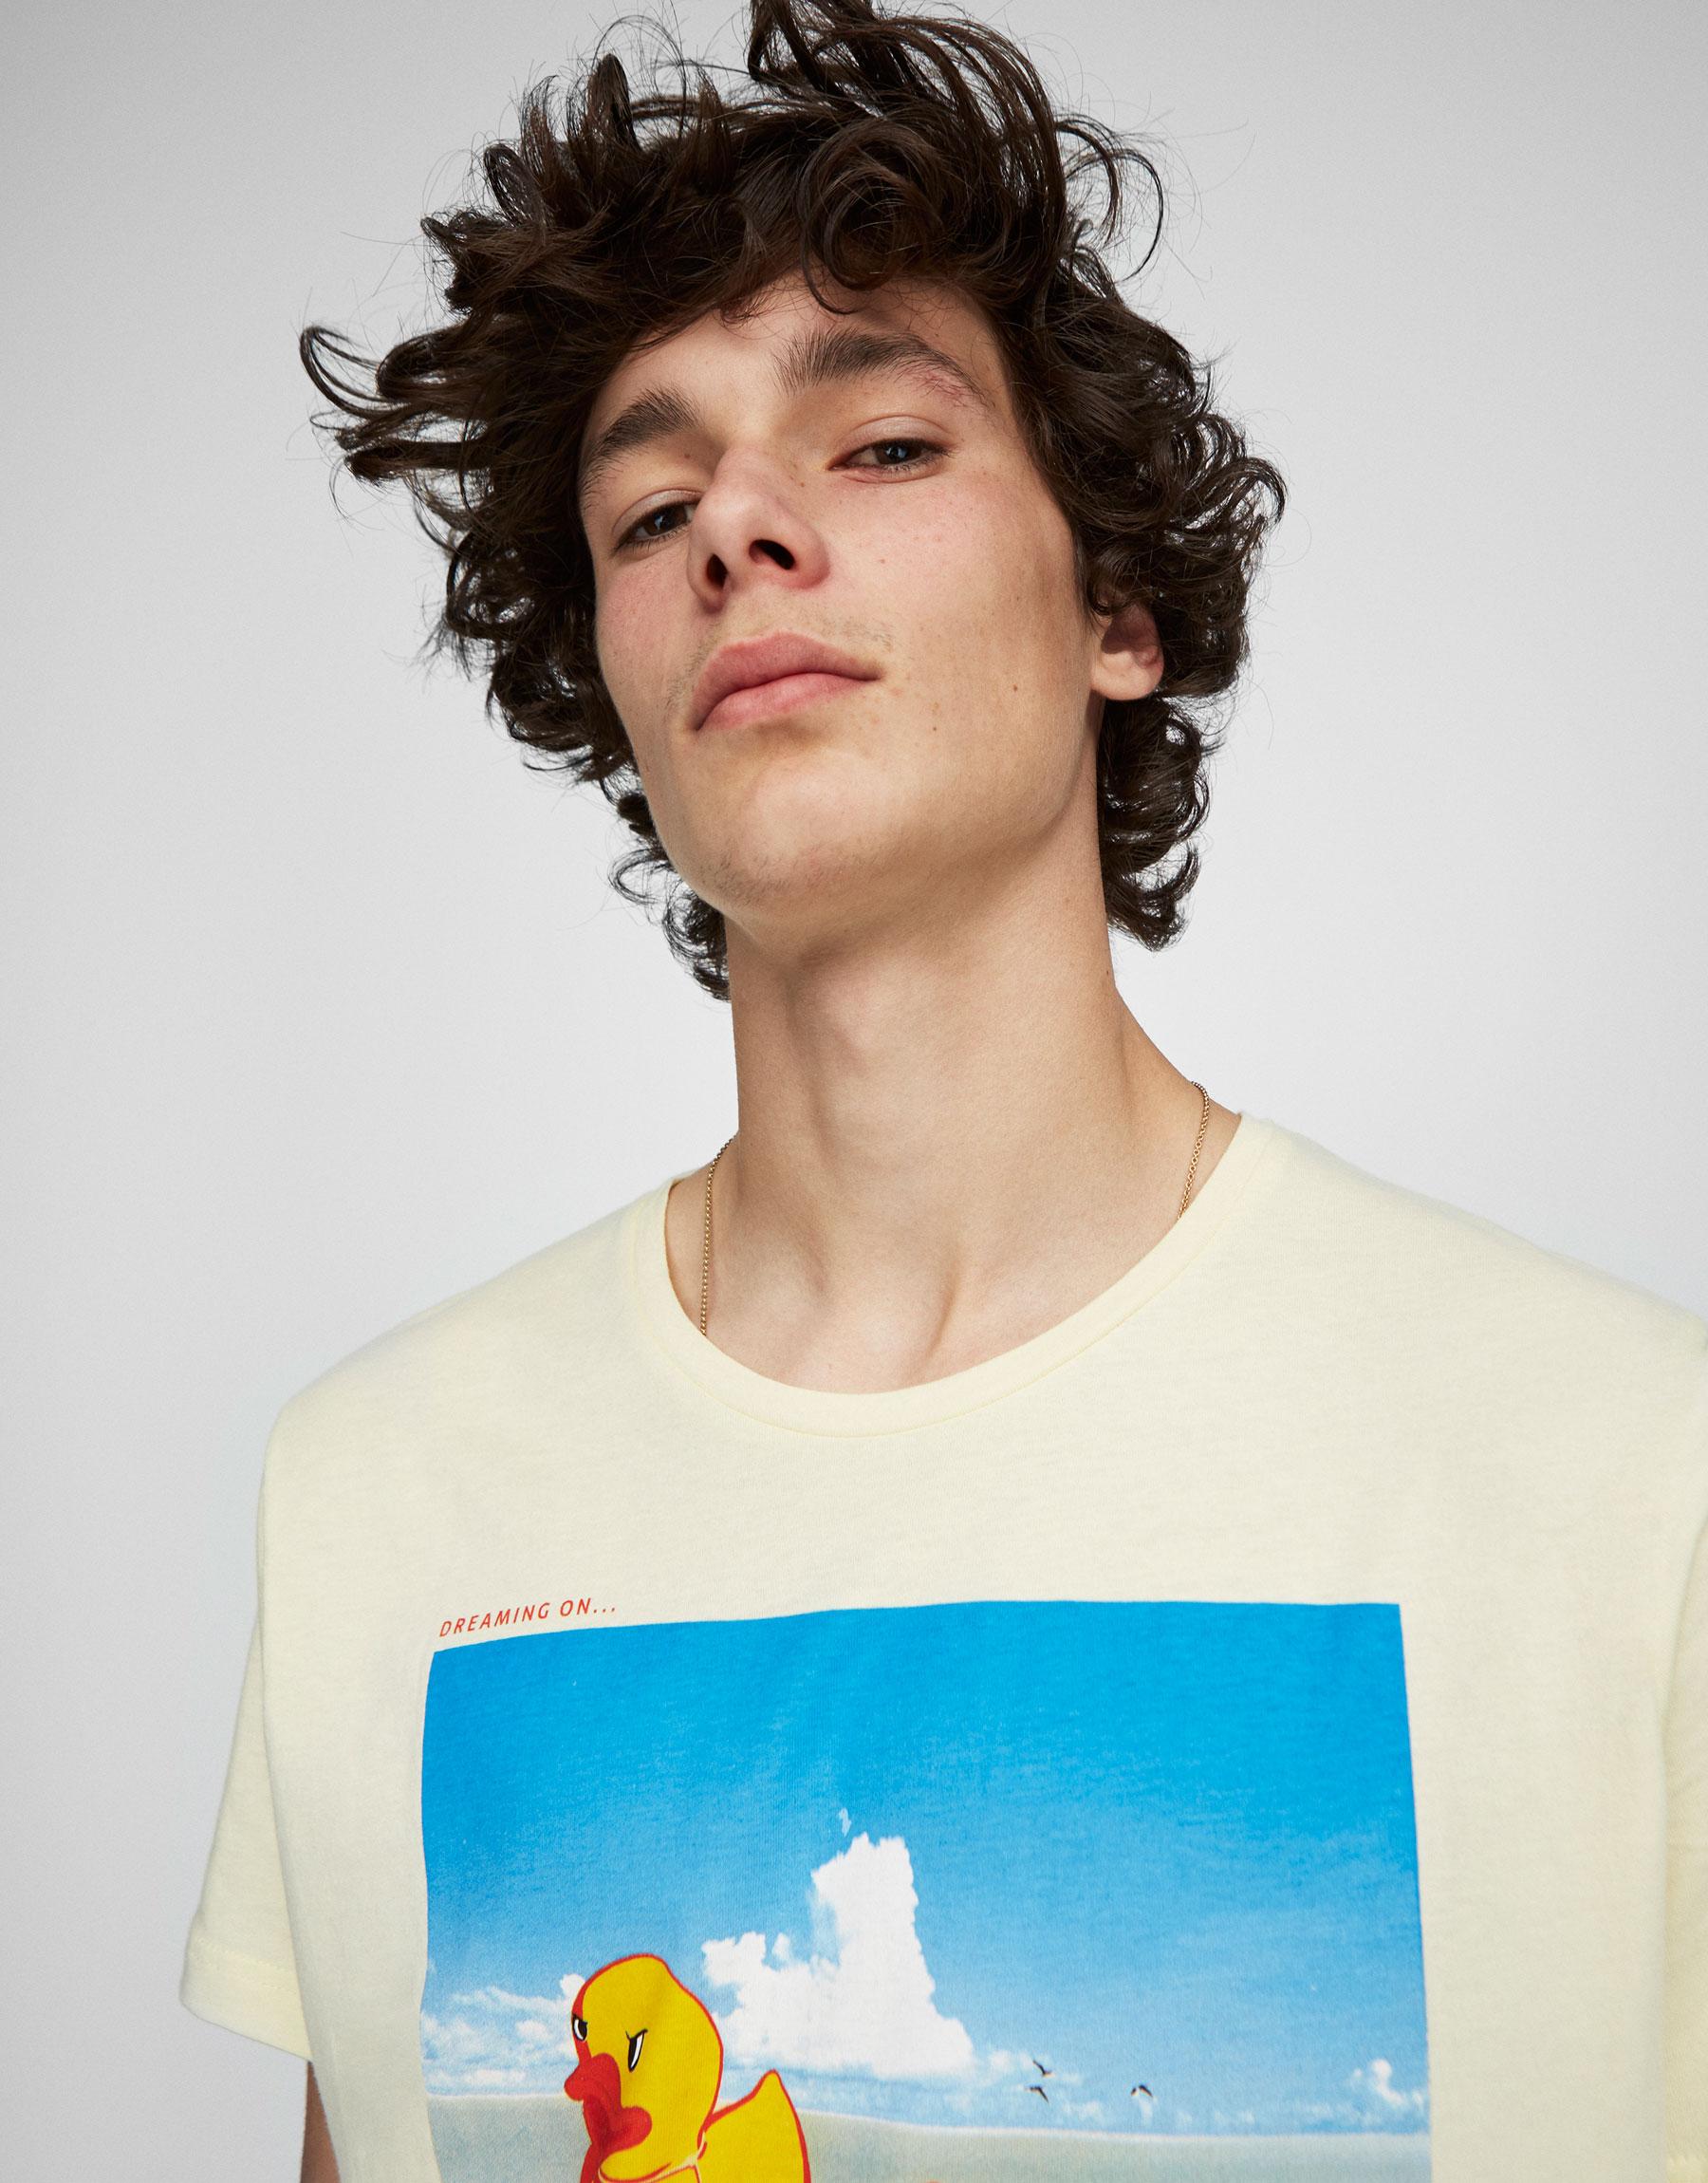 Duckling print T-shirt